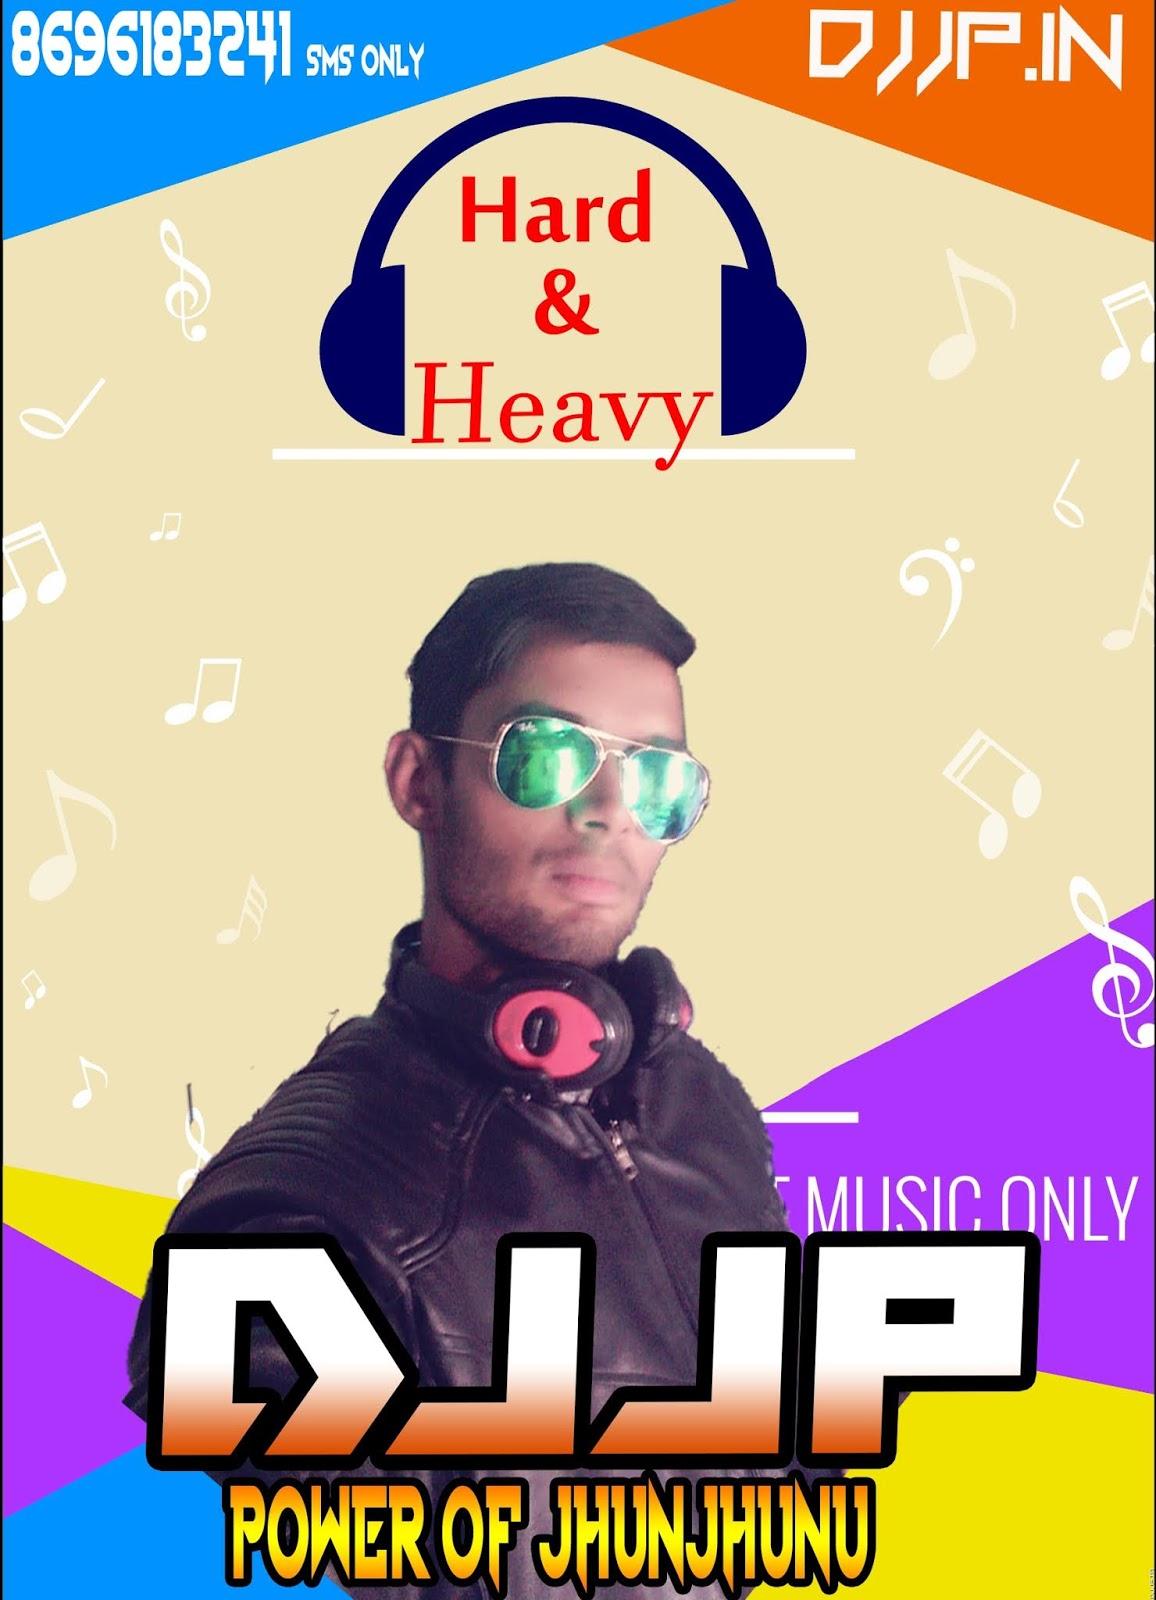 Jai Pubg Song Dj Remix Mp3 Download Naa Songs - Pubg Free On